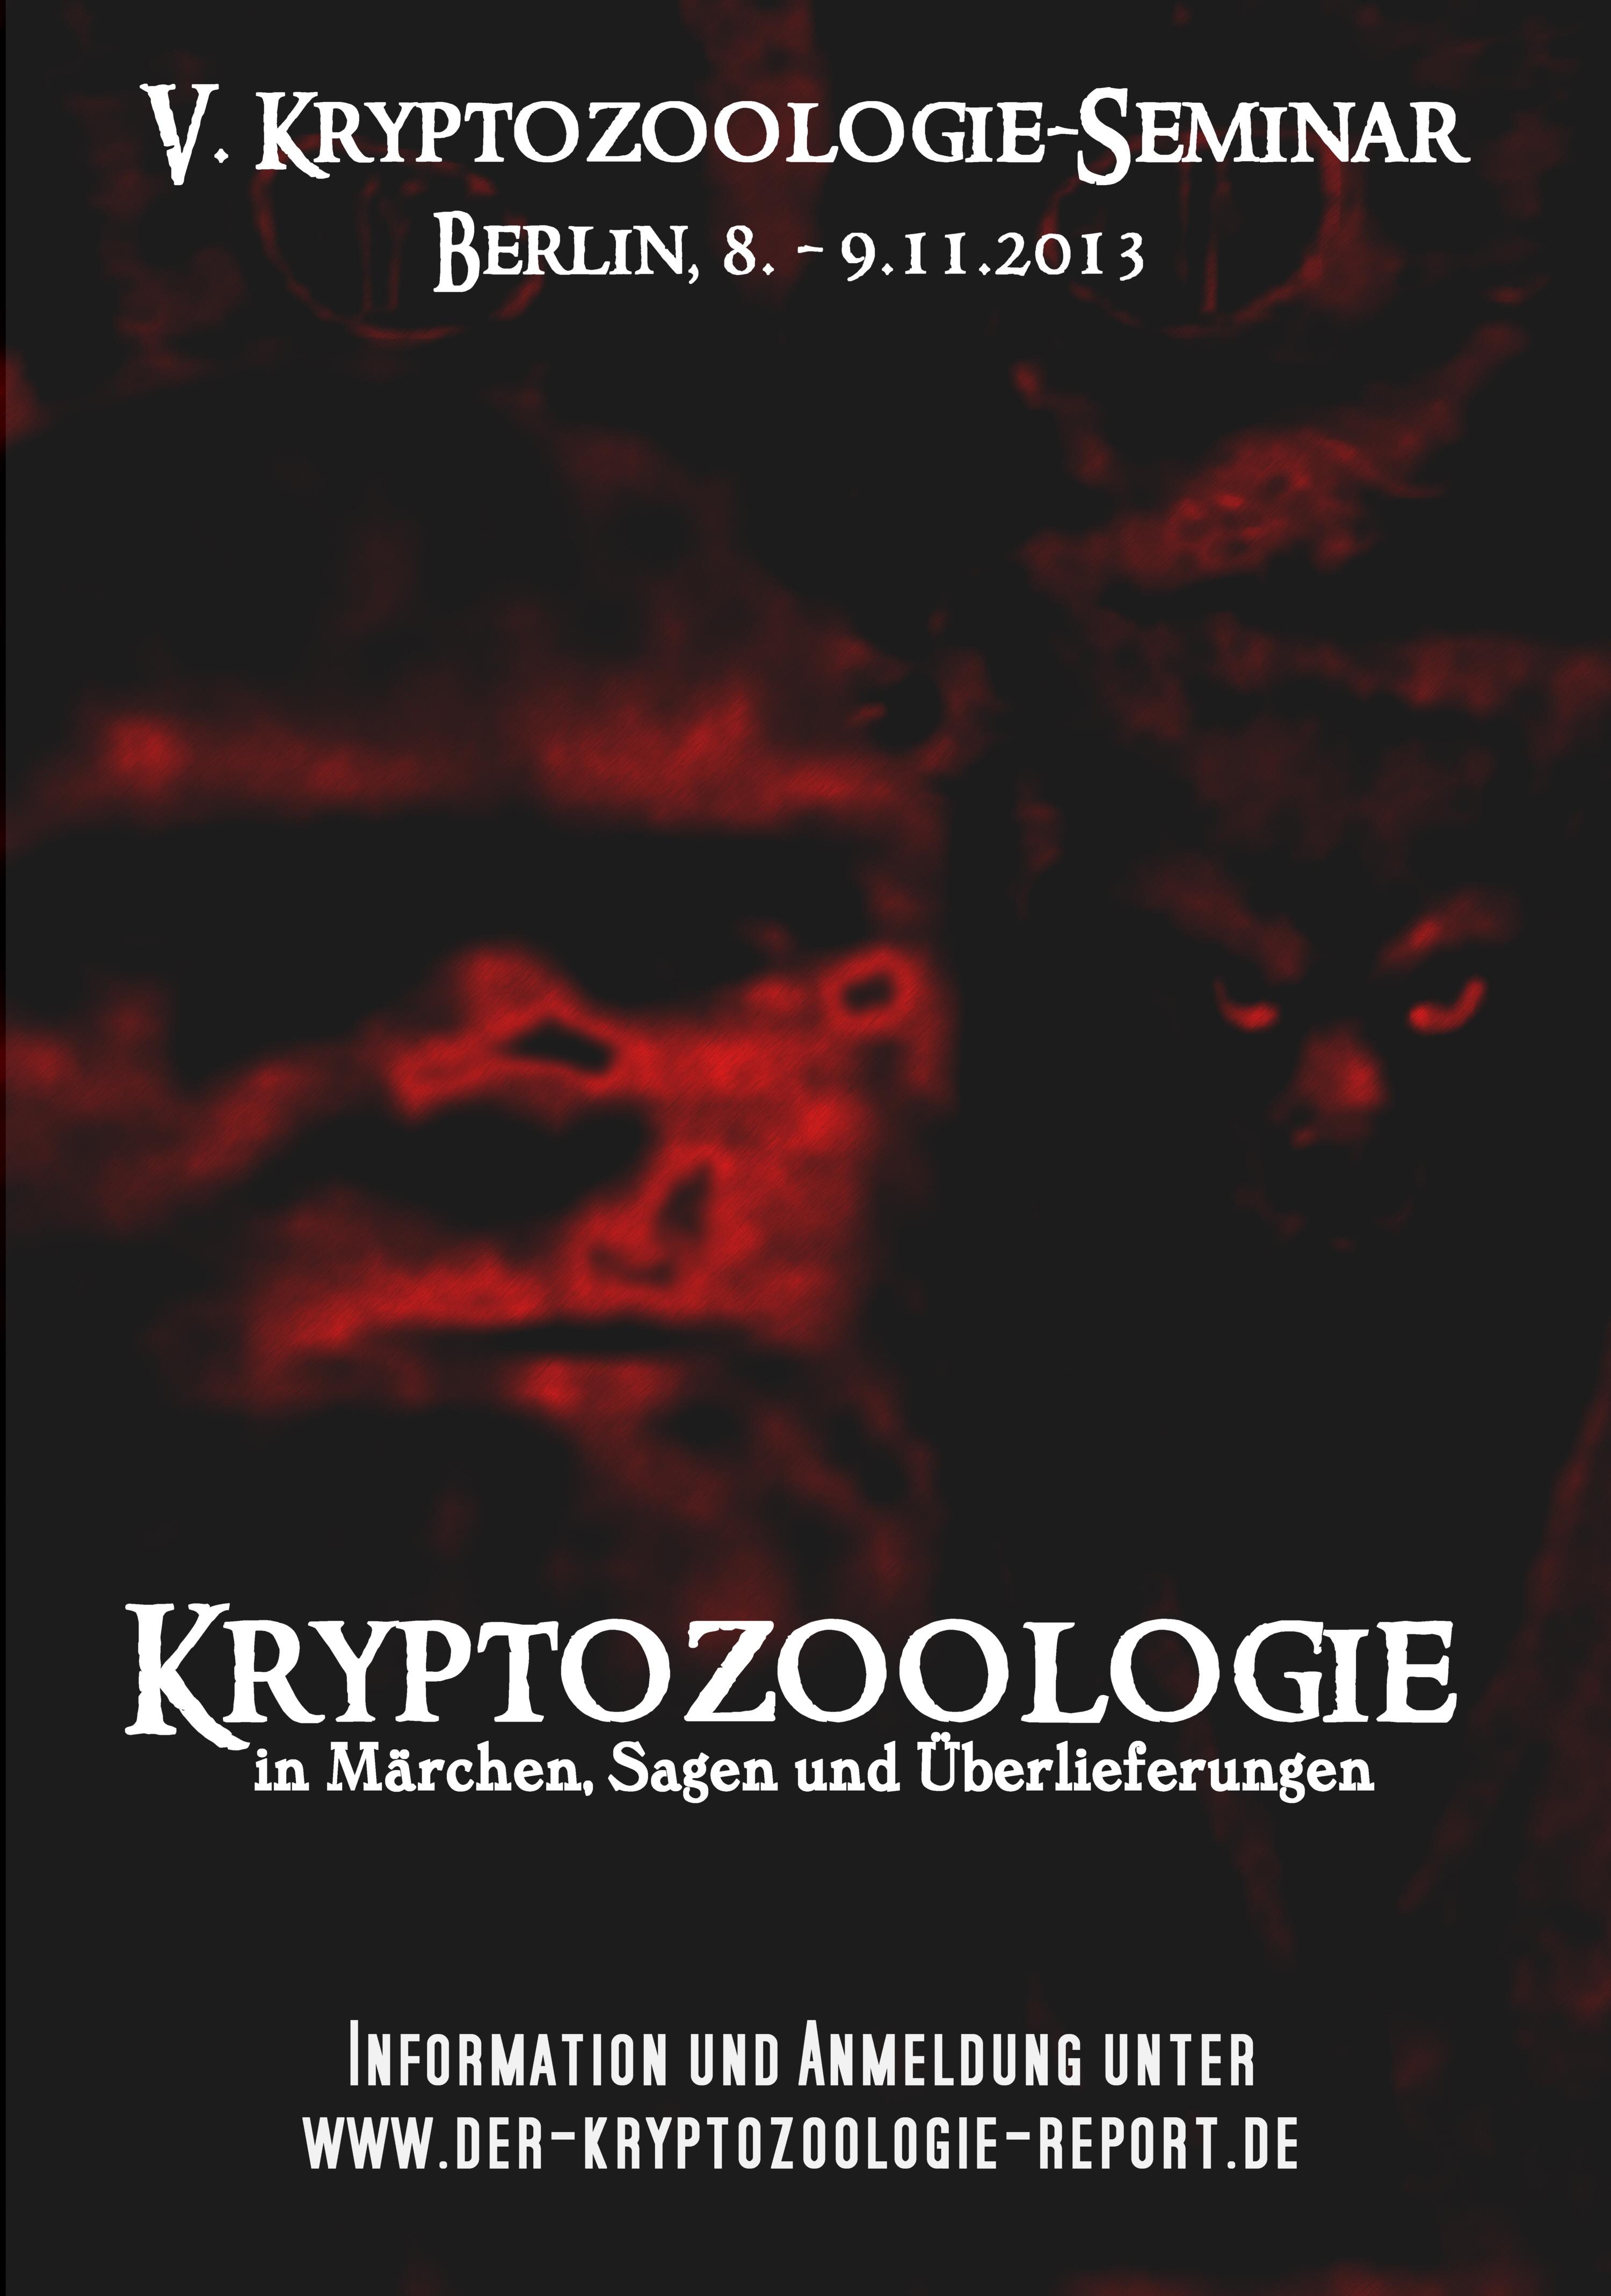 V. Kryptozoologie-Seminar